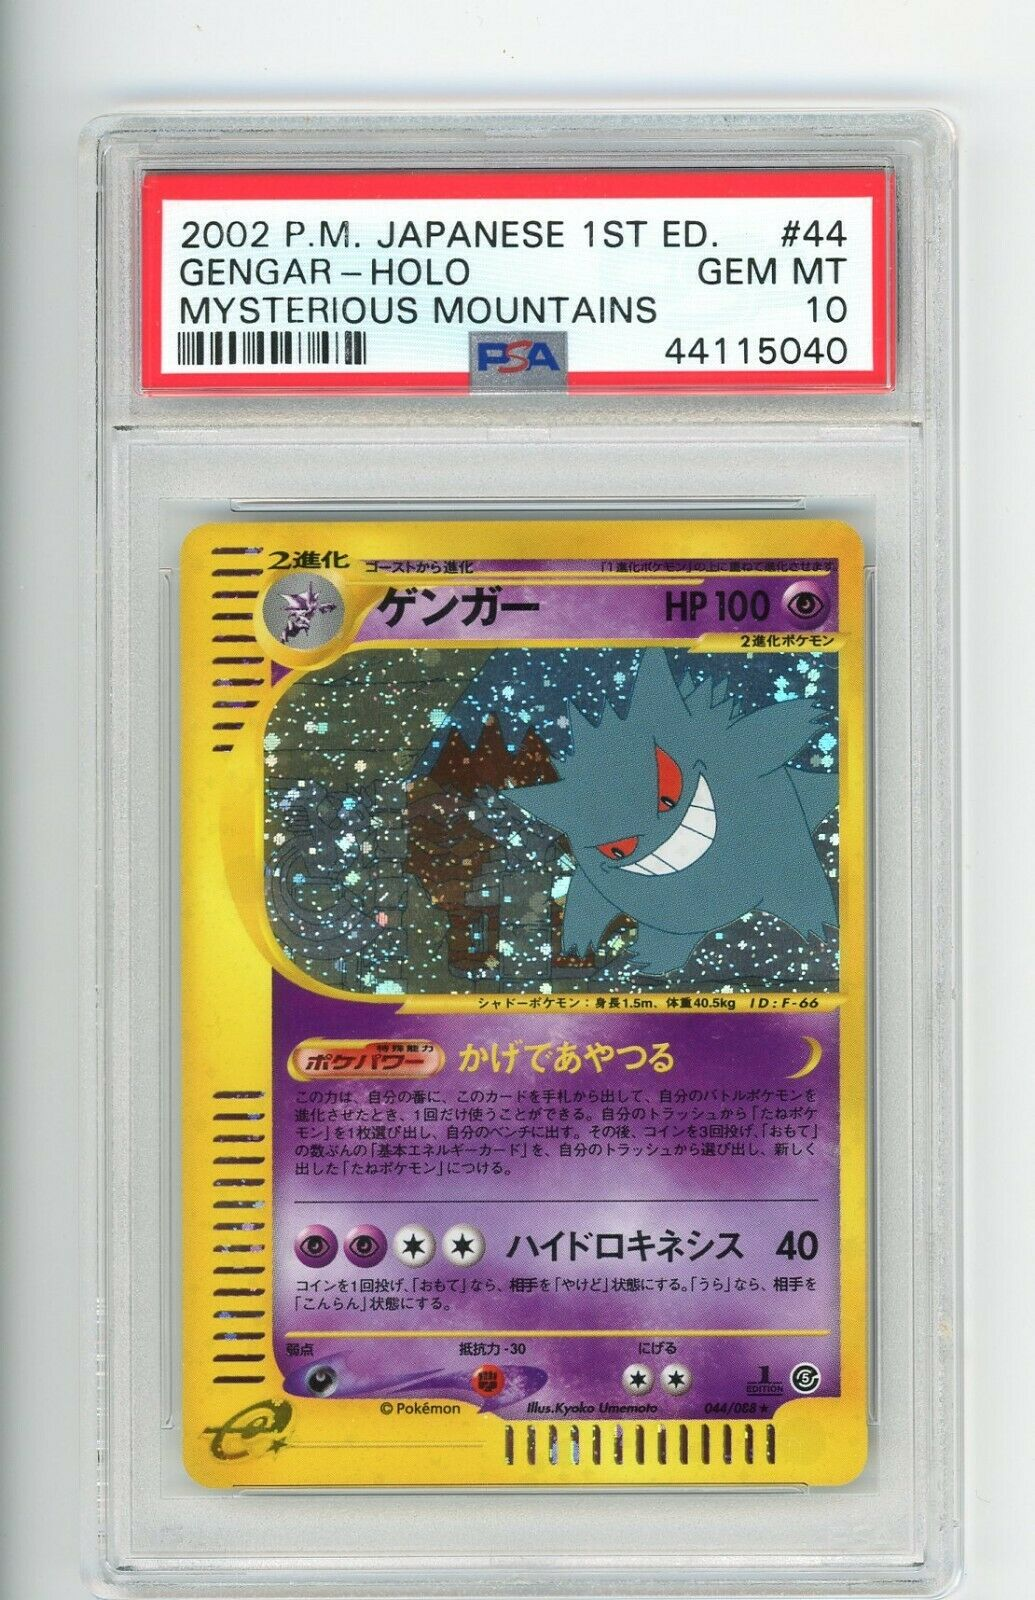 PSA 10 POKEMON JAPANESE GENGAR 4488 CARD 2002 1ST ED ESERIES SKYRIDGE